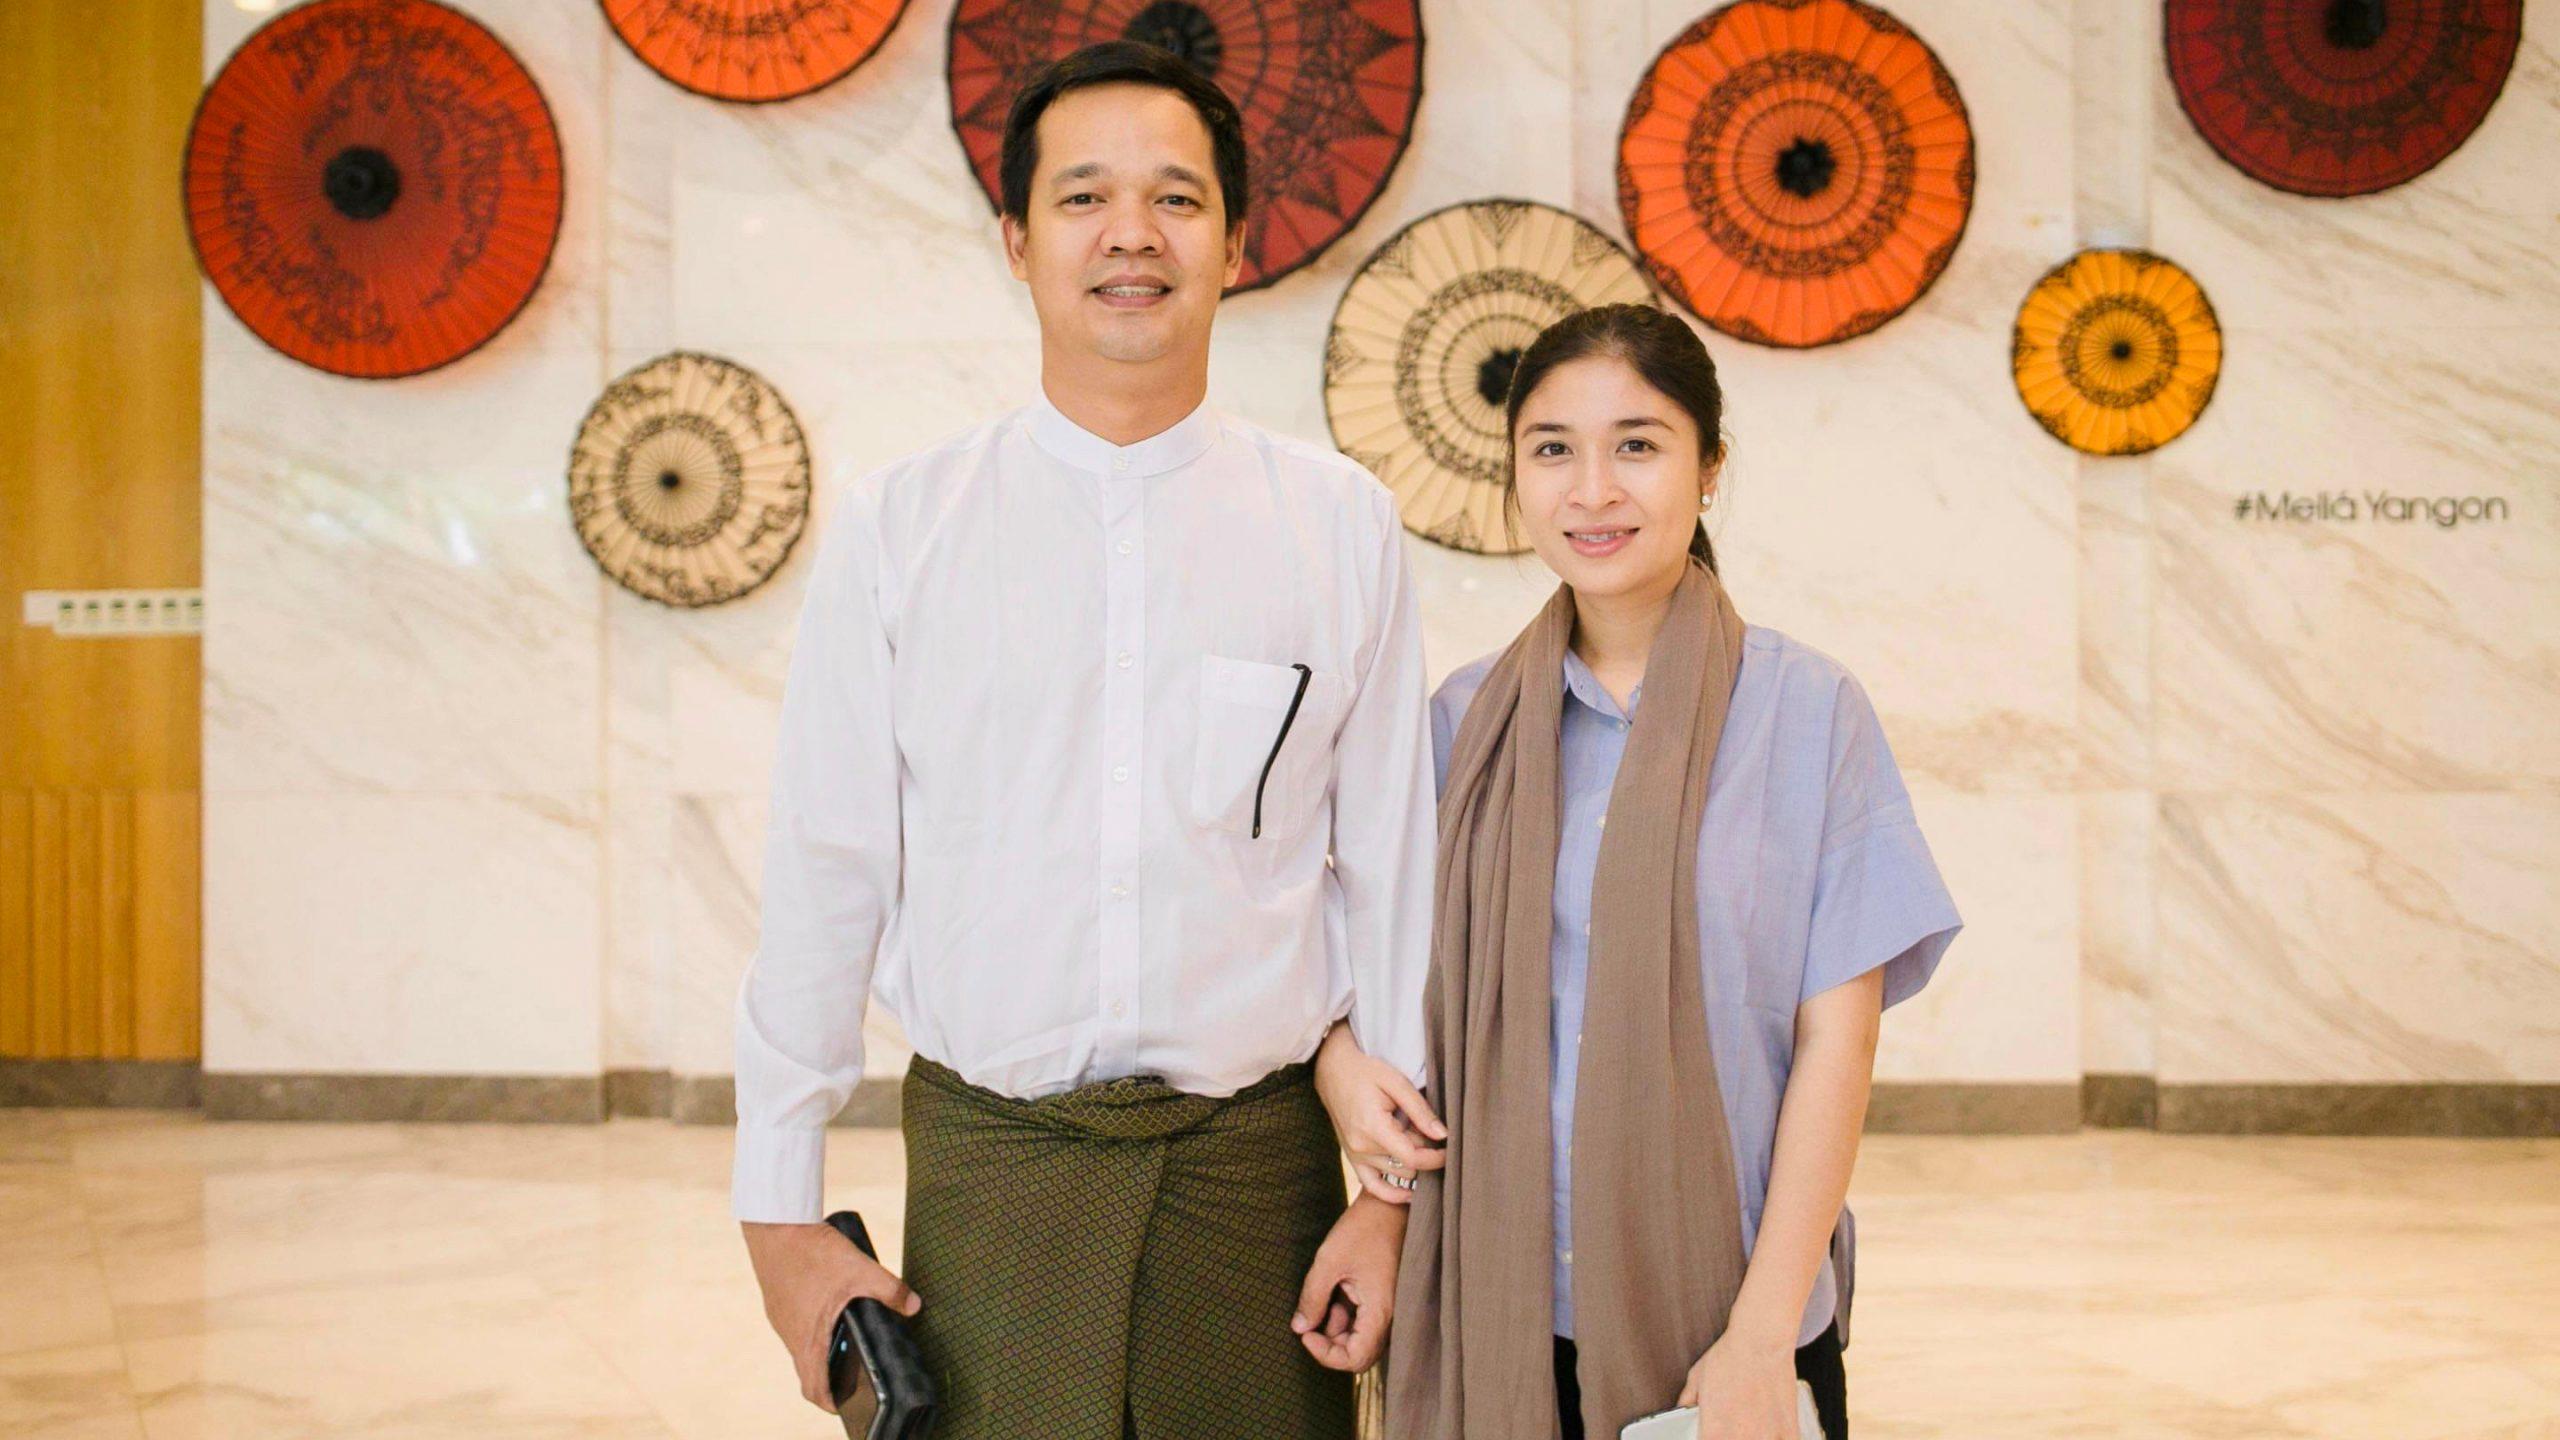 Ko Myo Win Aung and Ma Khin Yupar Aye